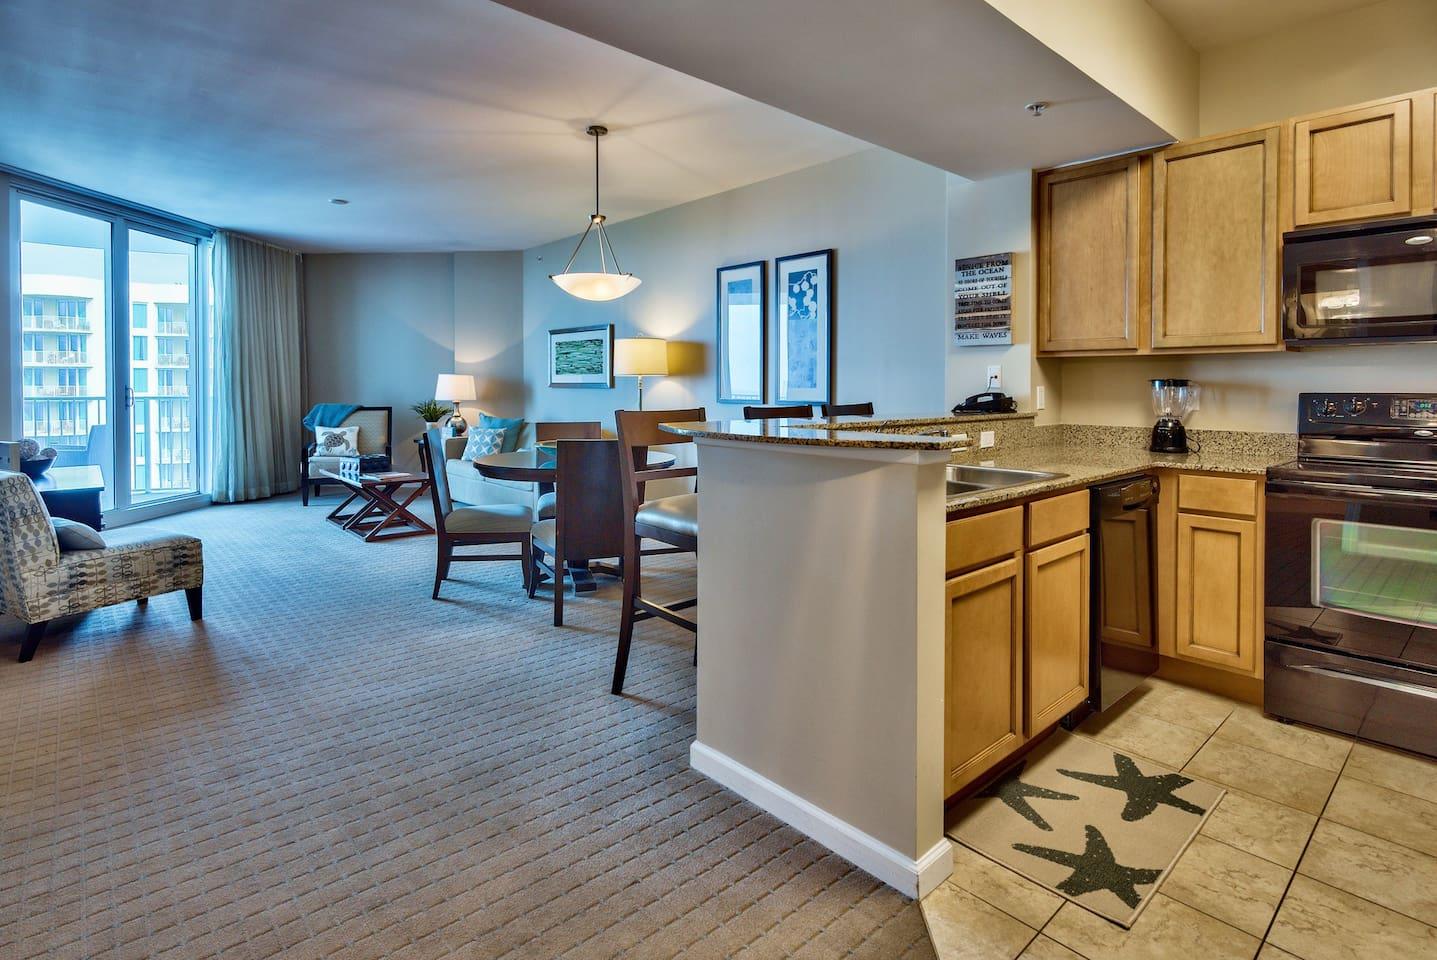 Copelands Palms Haven - Condominiums for Rent in Destin, Florida ...